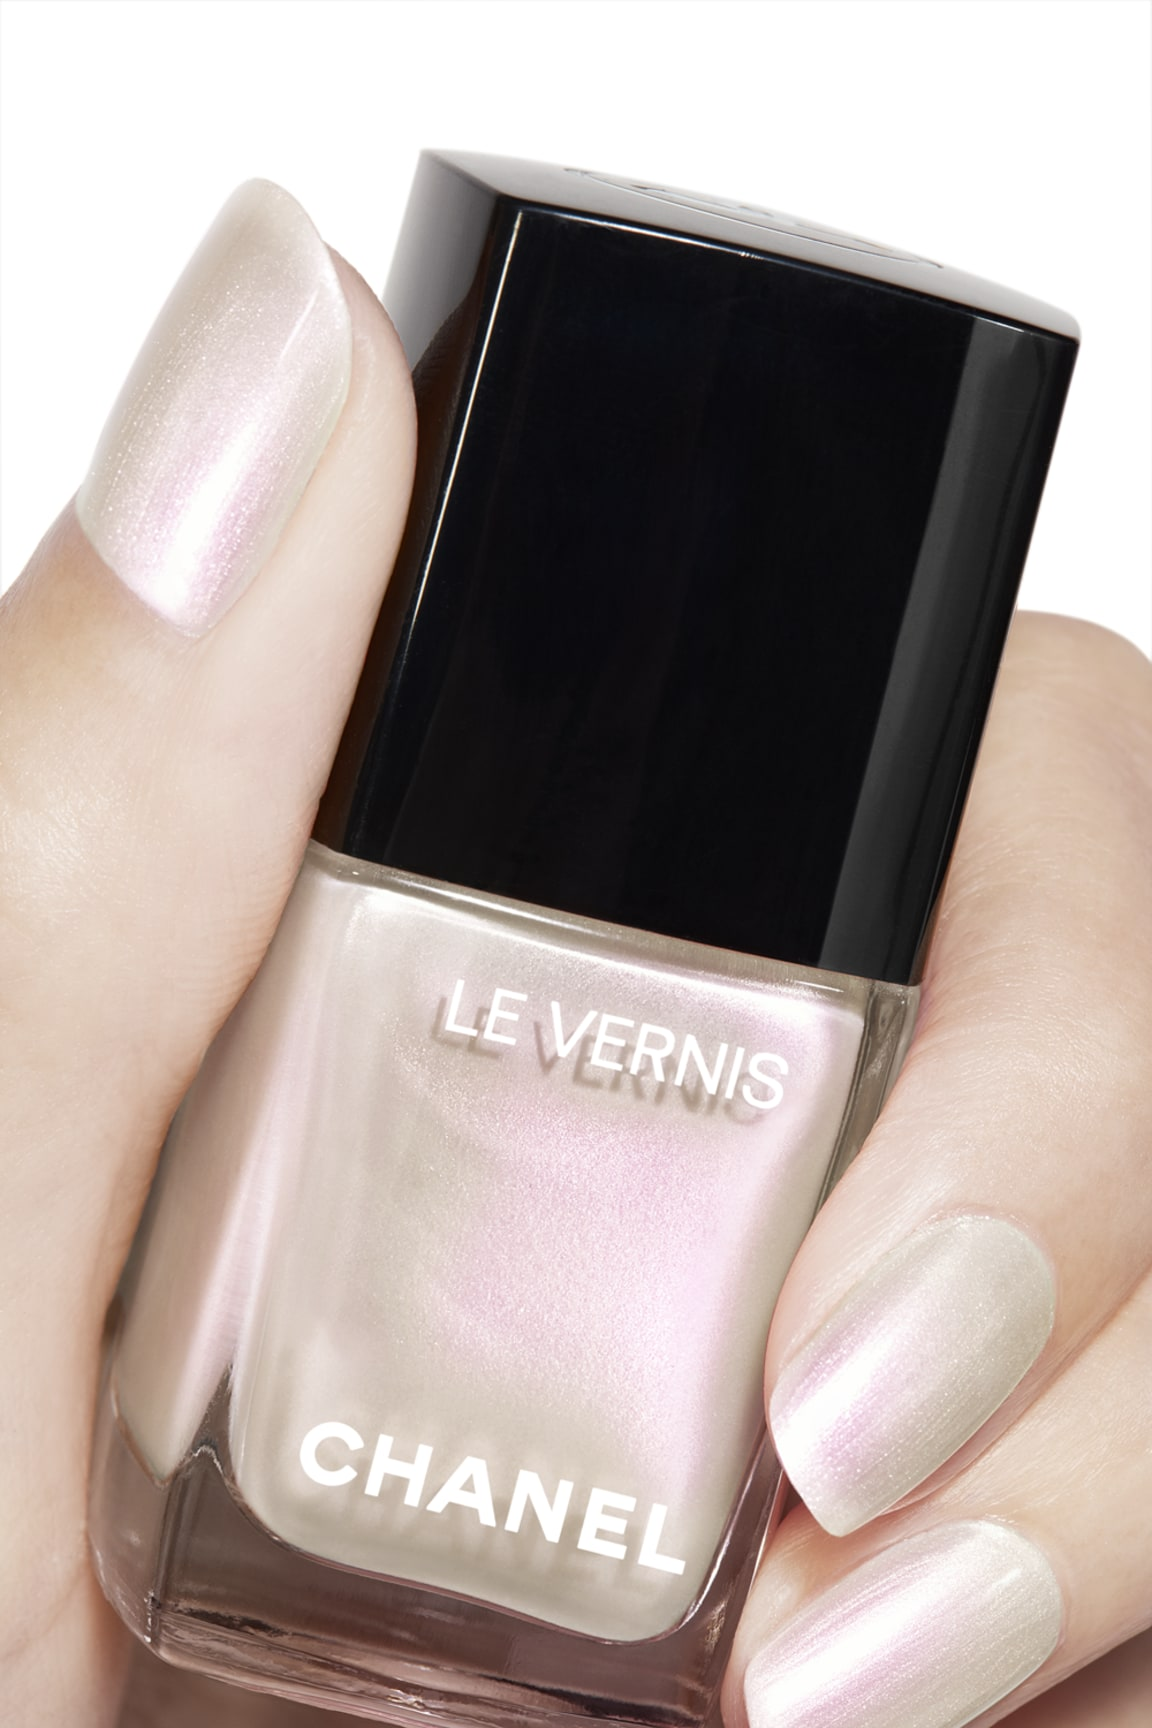 Application makeup visual 2 - LE VERNIS 889 - PERLE BLANCHE